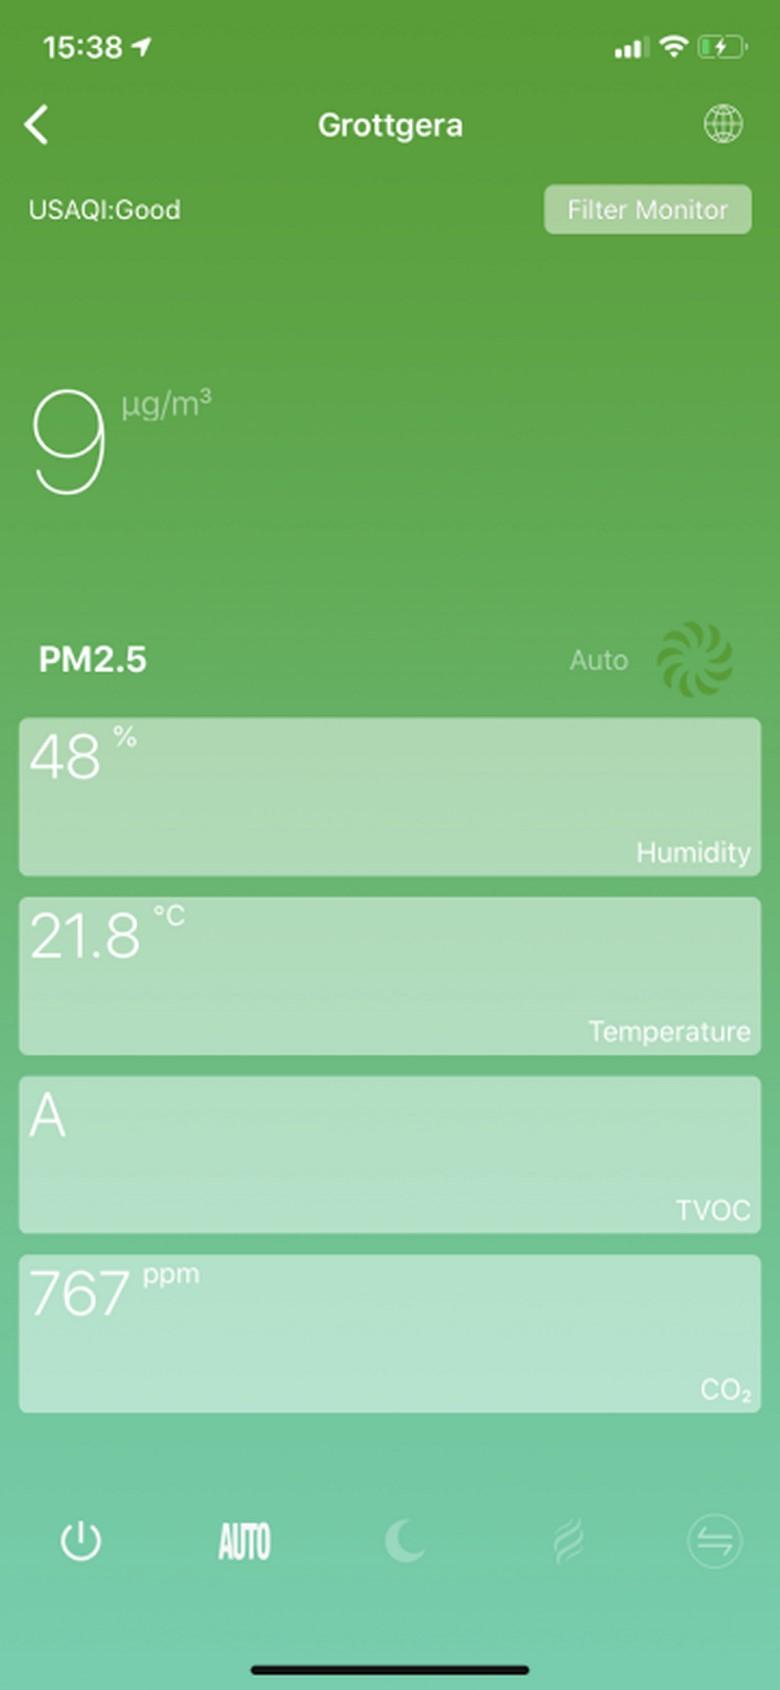 LIFAair-app-2